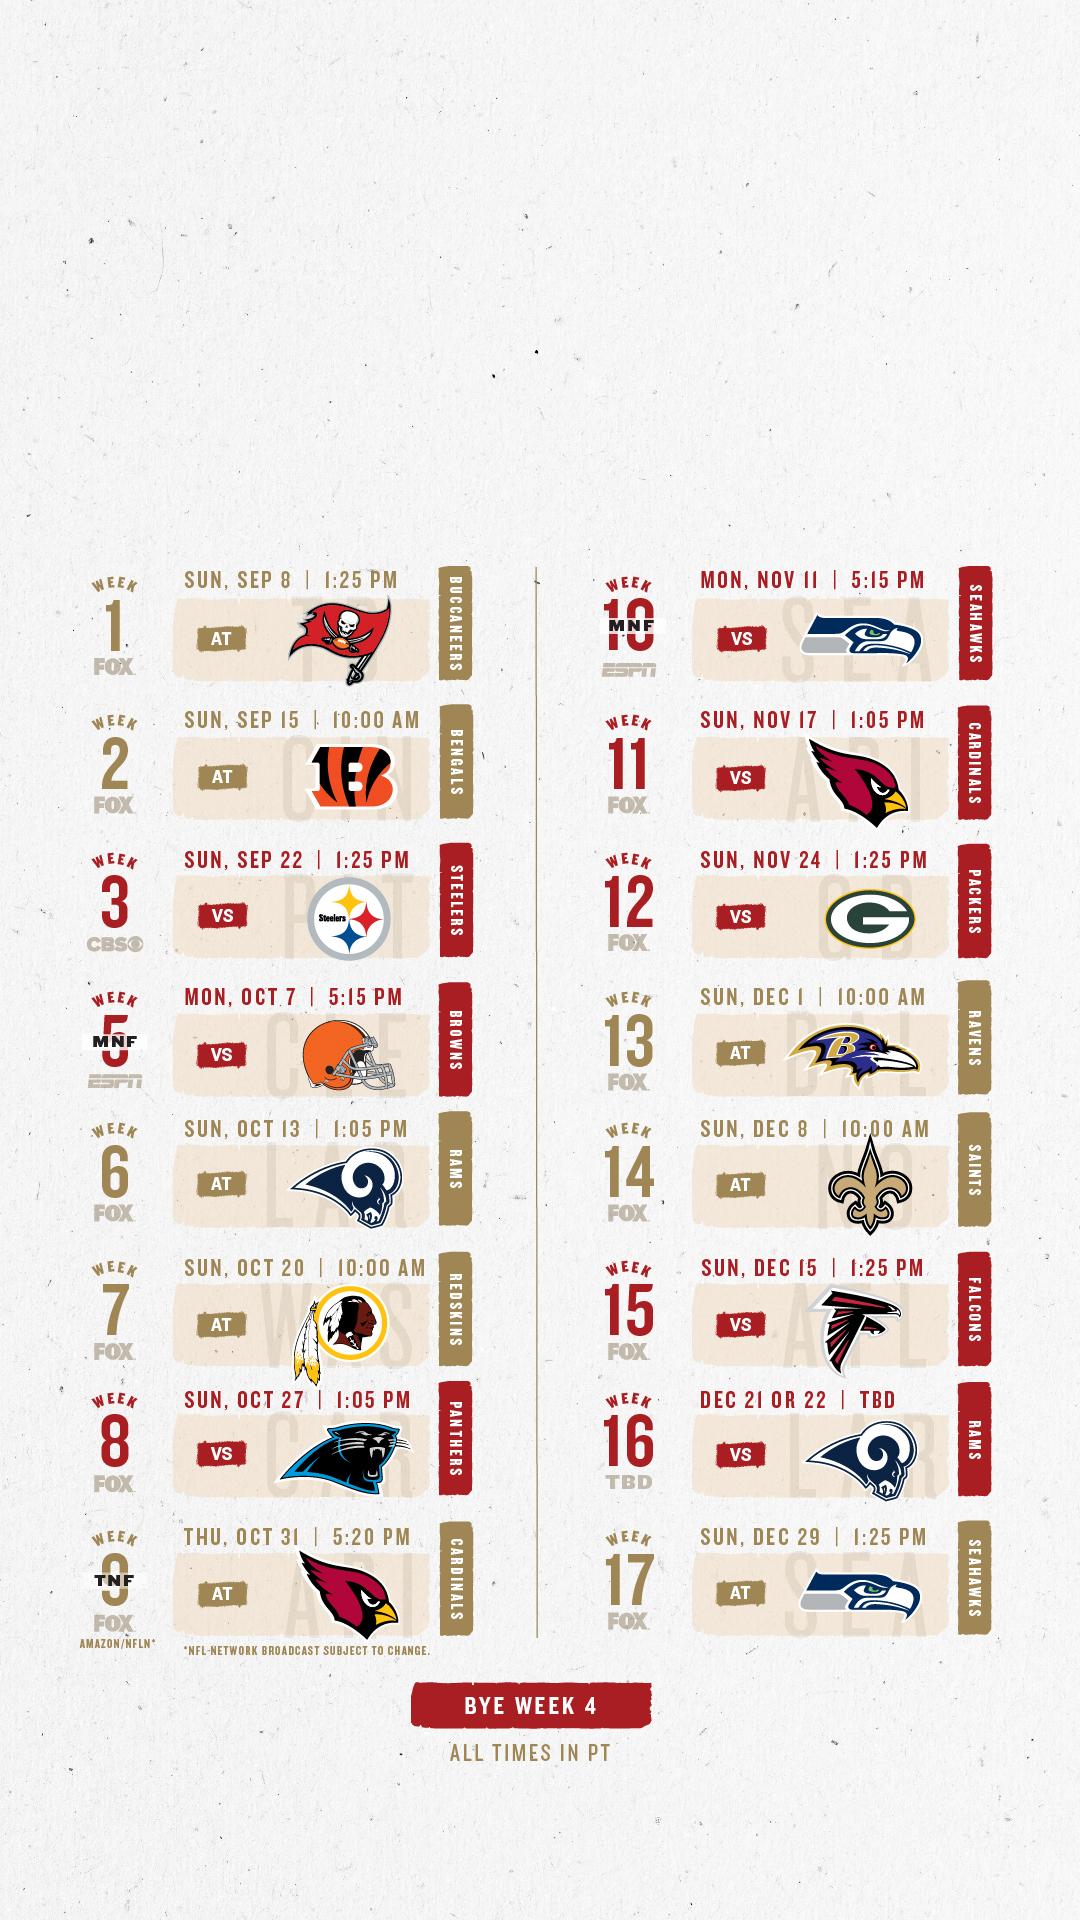 49ers 2020 Schedule.Sf 49ers 2020 Schedule Schedule 2020 Hermanbroodfilm